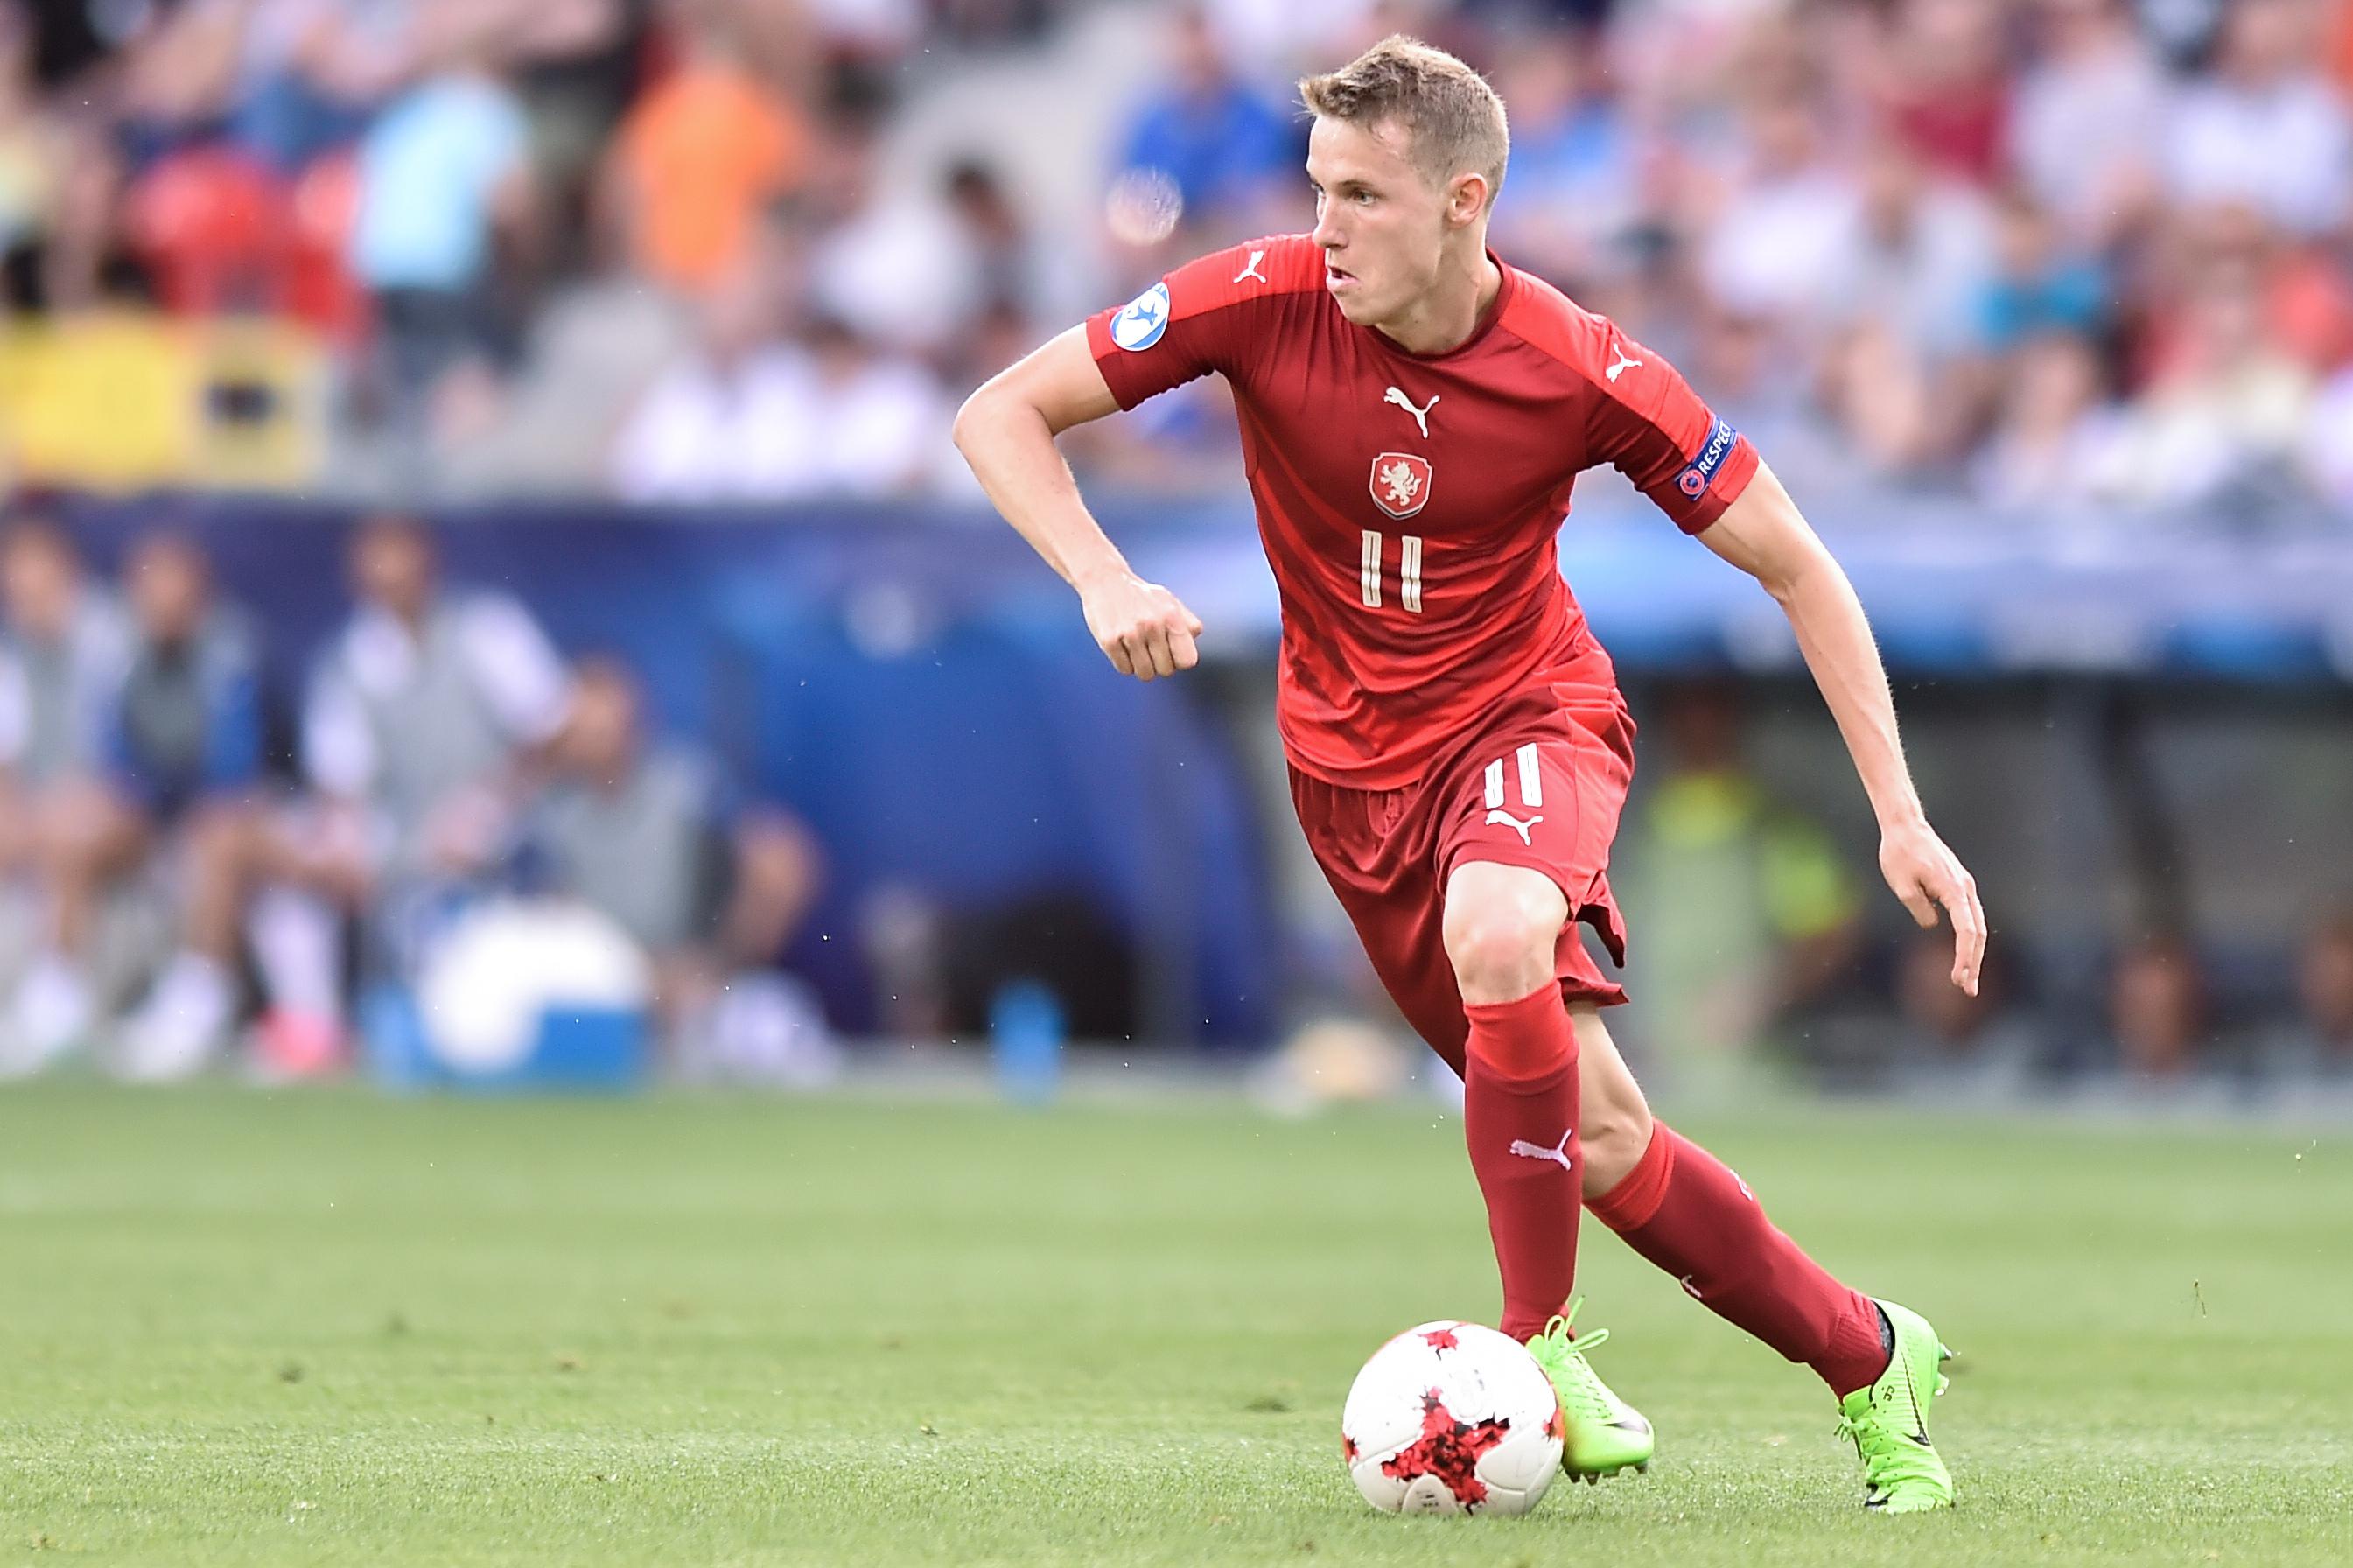 Arsenal Transfer News: Udinese Dismiss Jakub Jankto January Exit Rumours | Bleacher Report | Latest News, Videos and Highlights